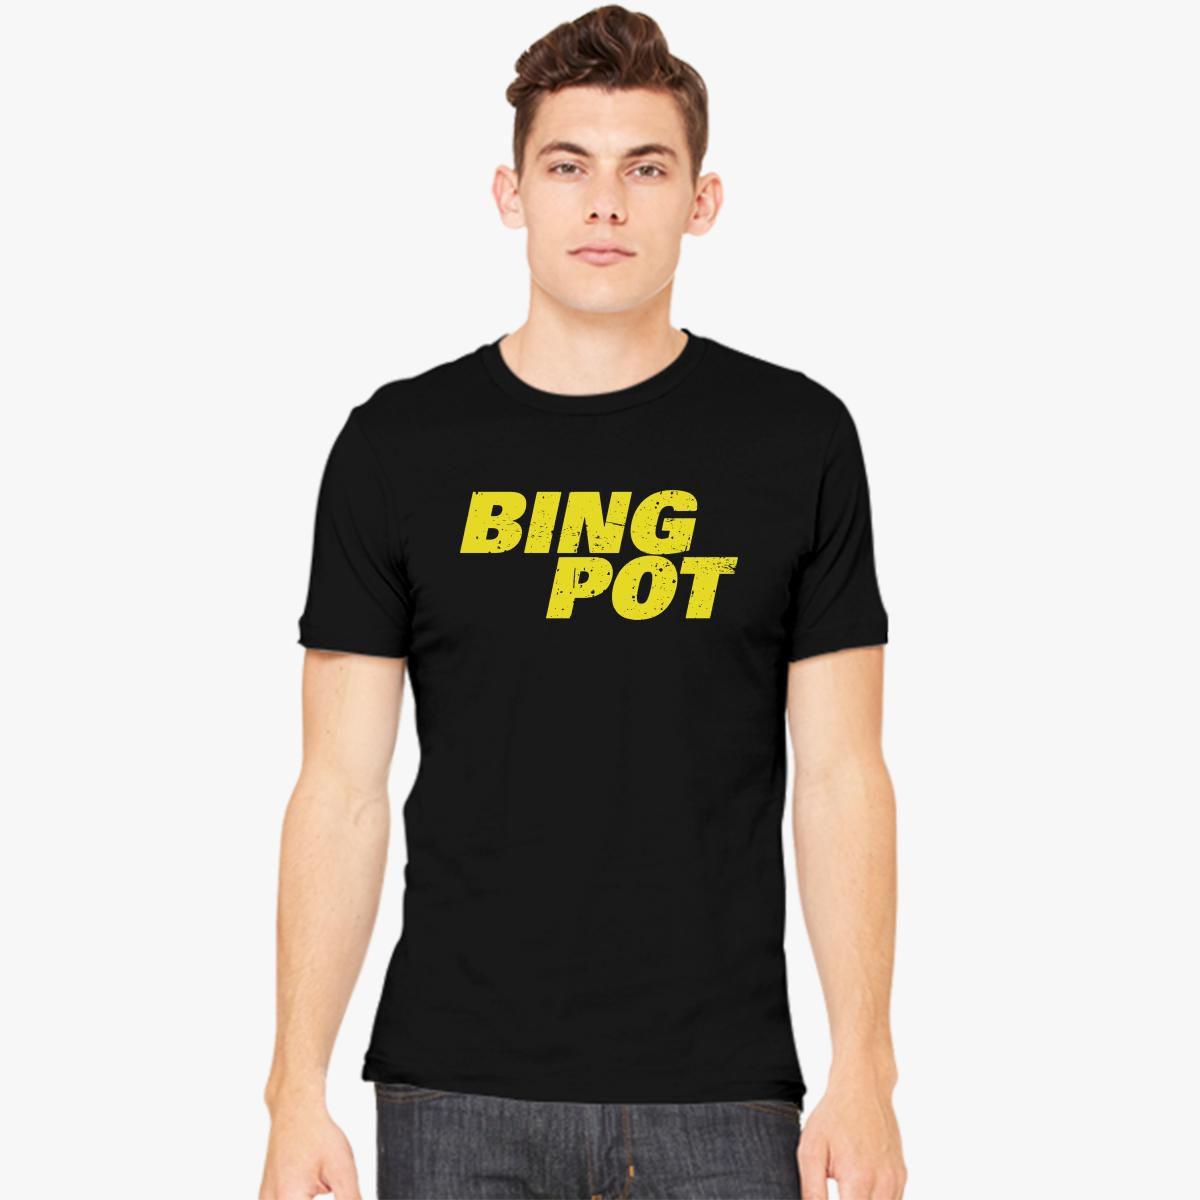 497e5b5a1 Brooklyn Nine Nine Bingpot T Shirt Men's T-shirt - Customon